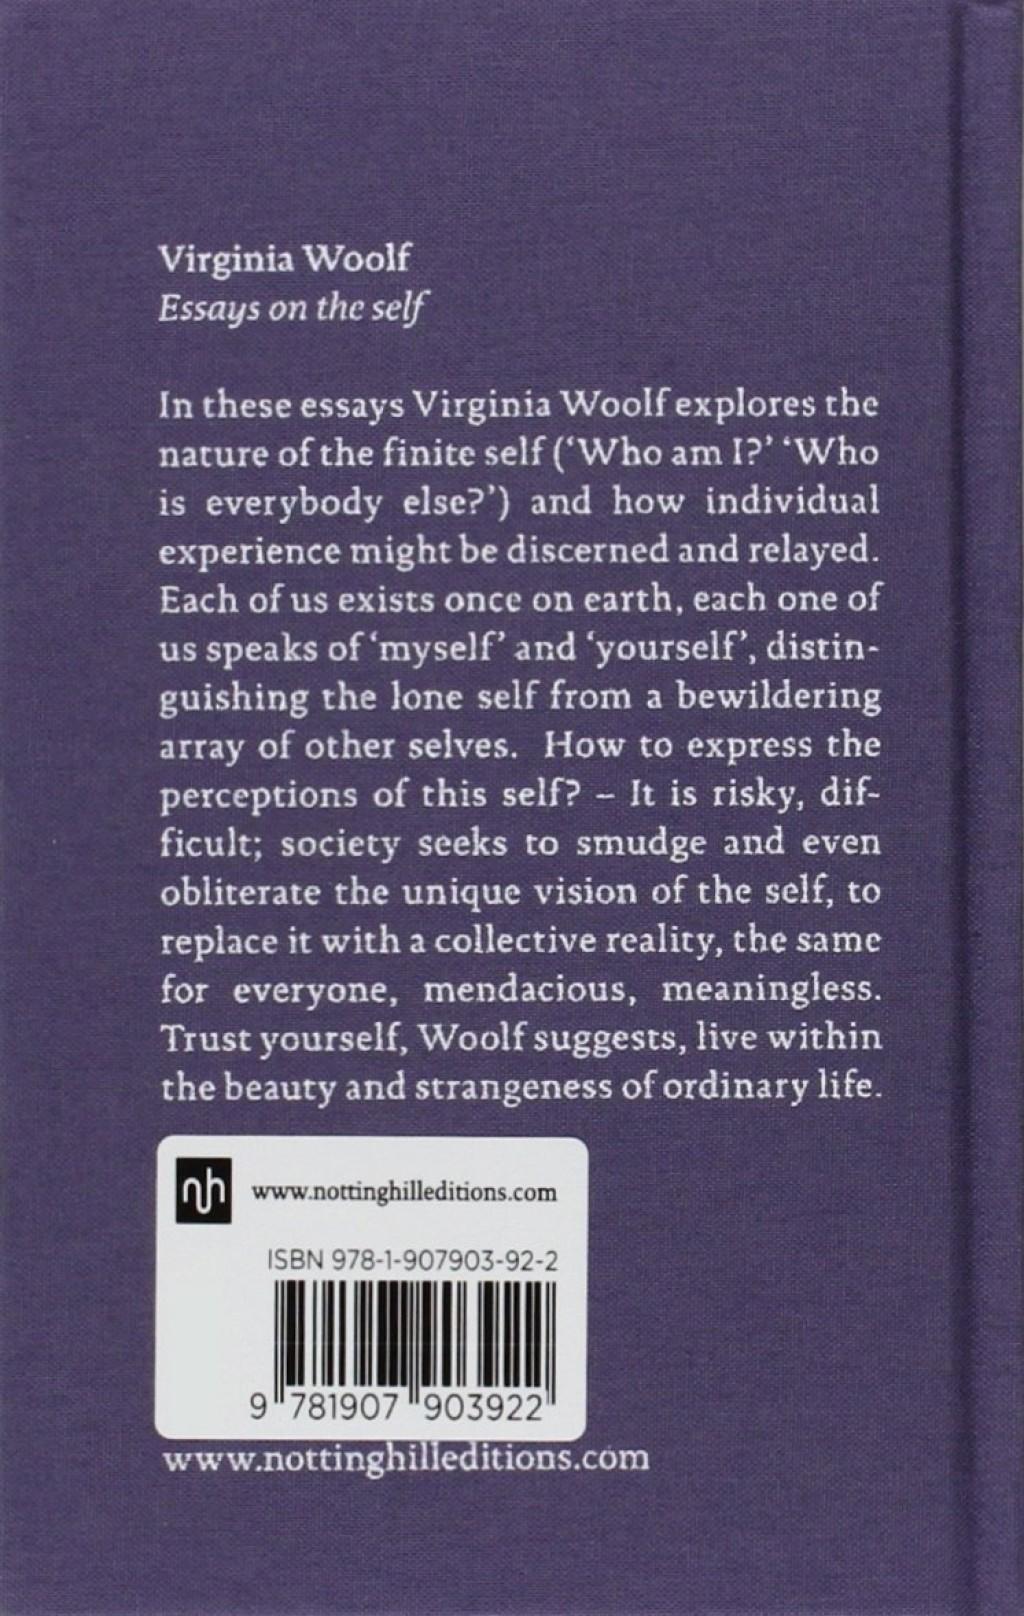 005 Virginia Woolf Essays 71jqd2u92bhl Essay Unusual Online The Modern Analysis On Self Large